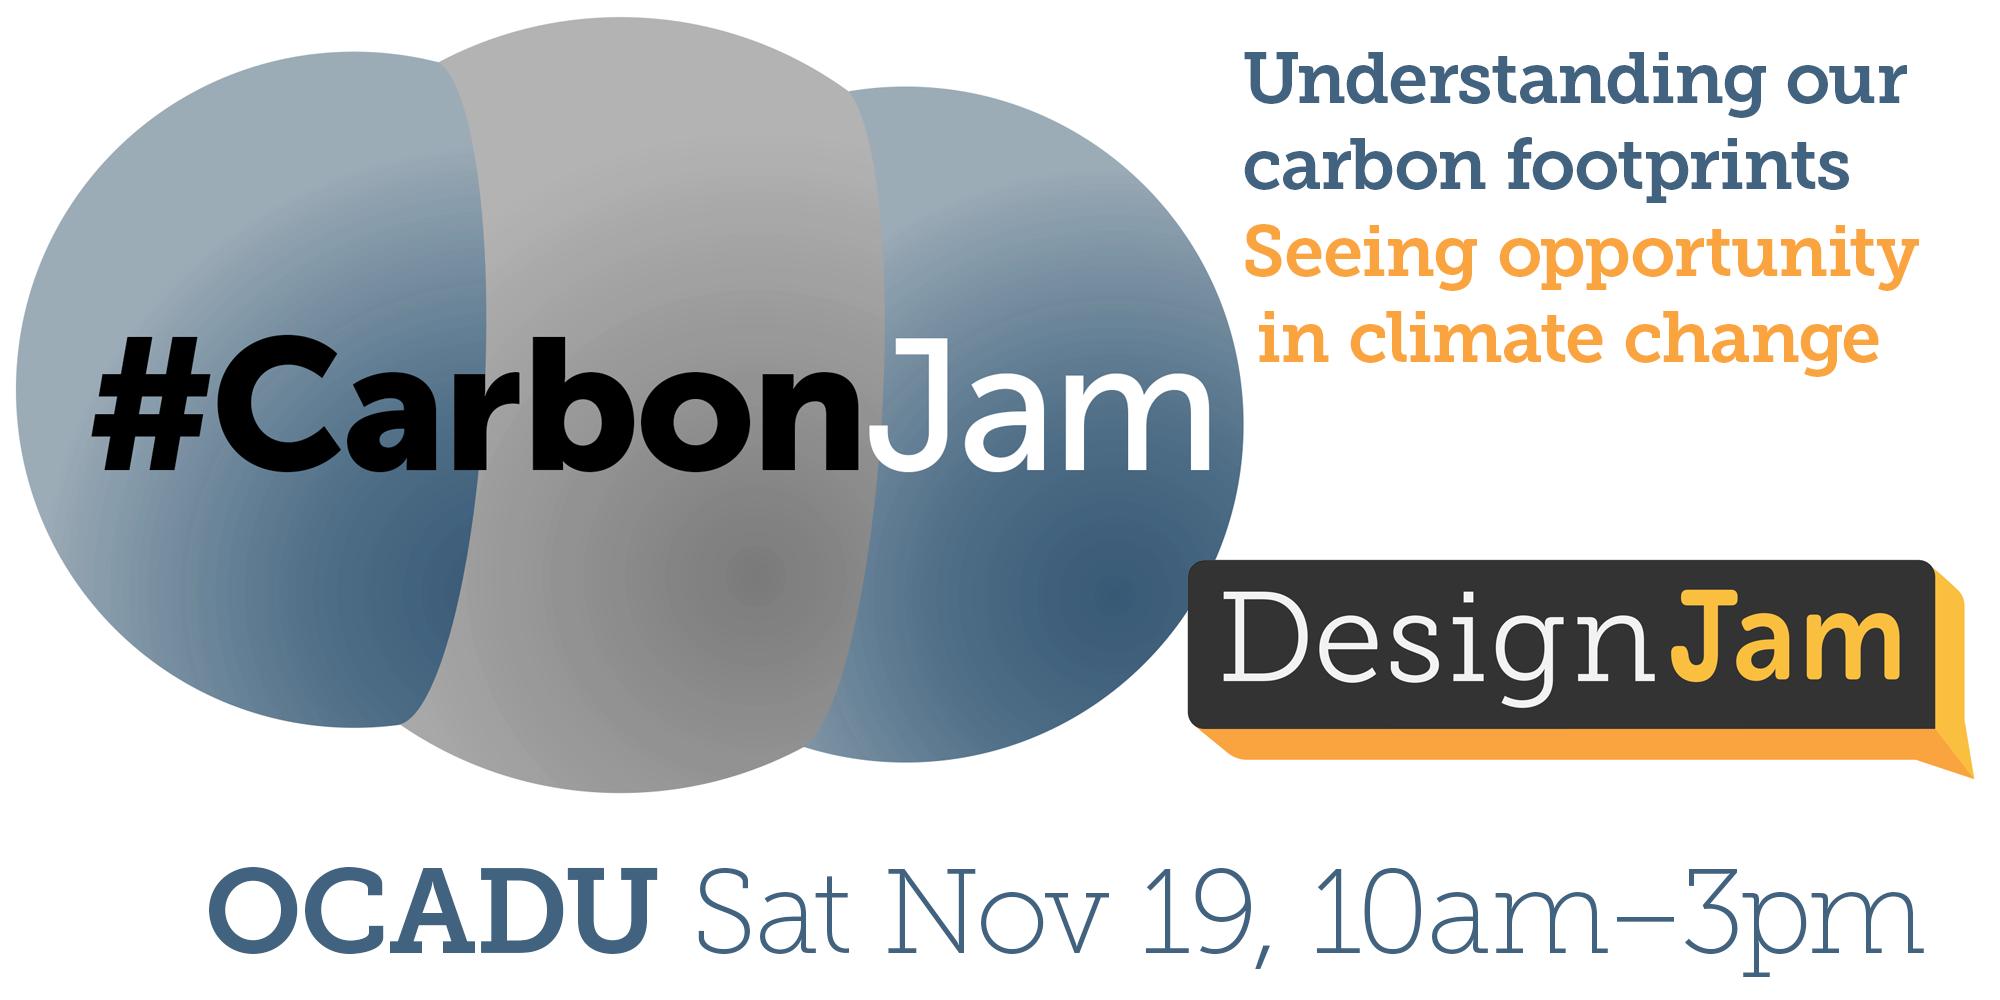 CarbonJam, DesignJam, date, time